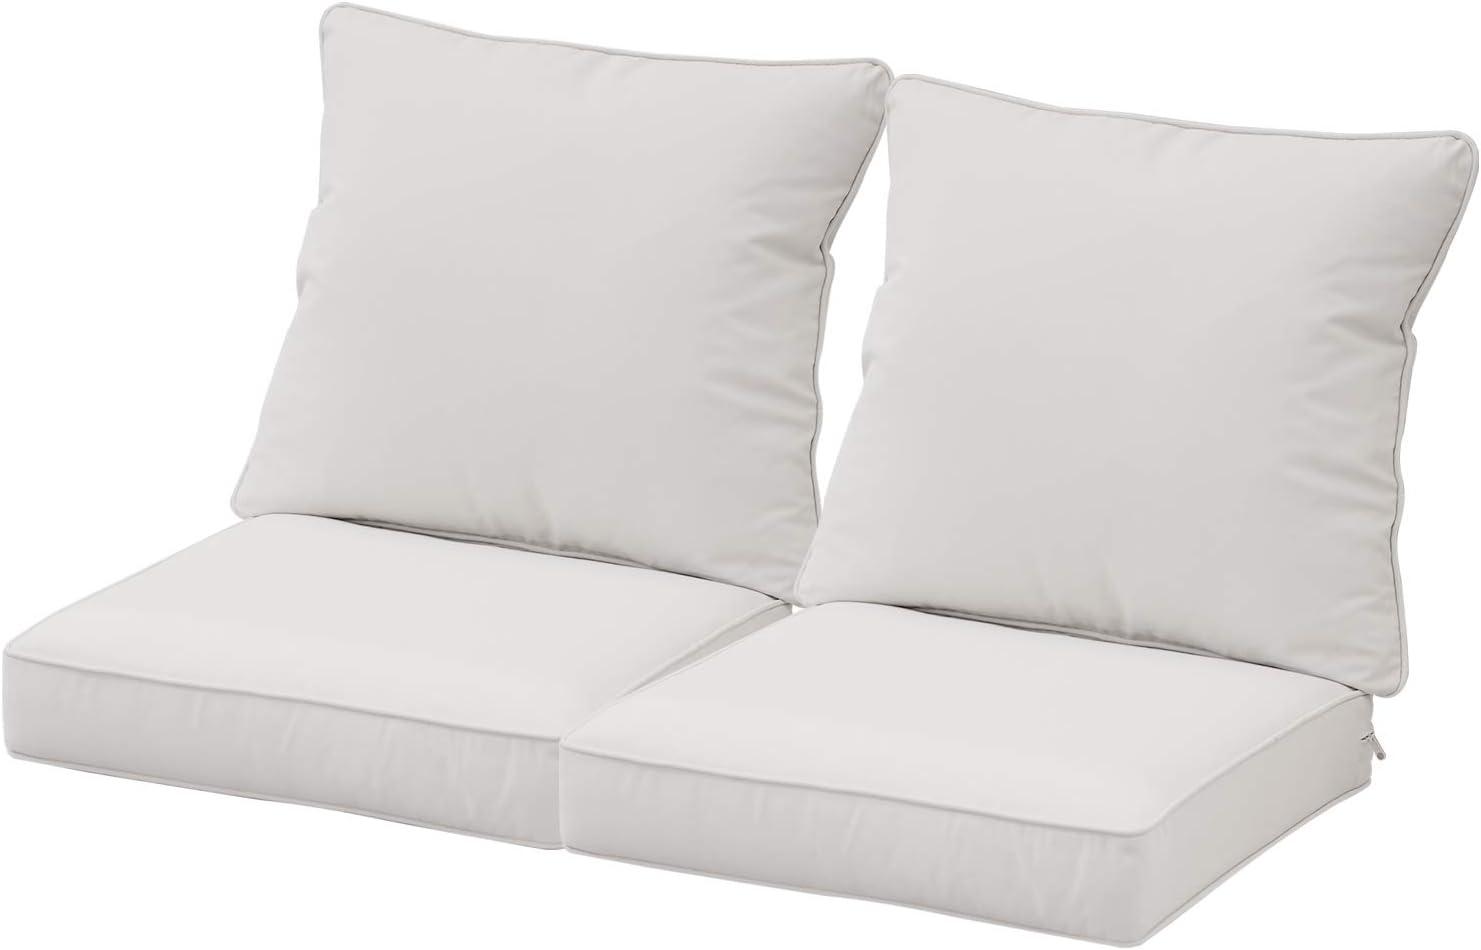 "Aoodor 24"" x 24"" Patio Furniture Outdoor Deep Seat Single Chair Sofa Cushion Back Olefin Fabric Slipcover Sponge Foam - Beige Color Set of 2 ( 2 Back and 2 Seater)"